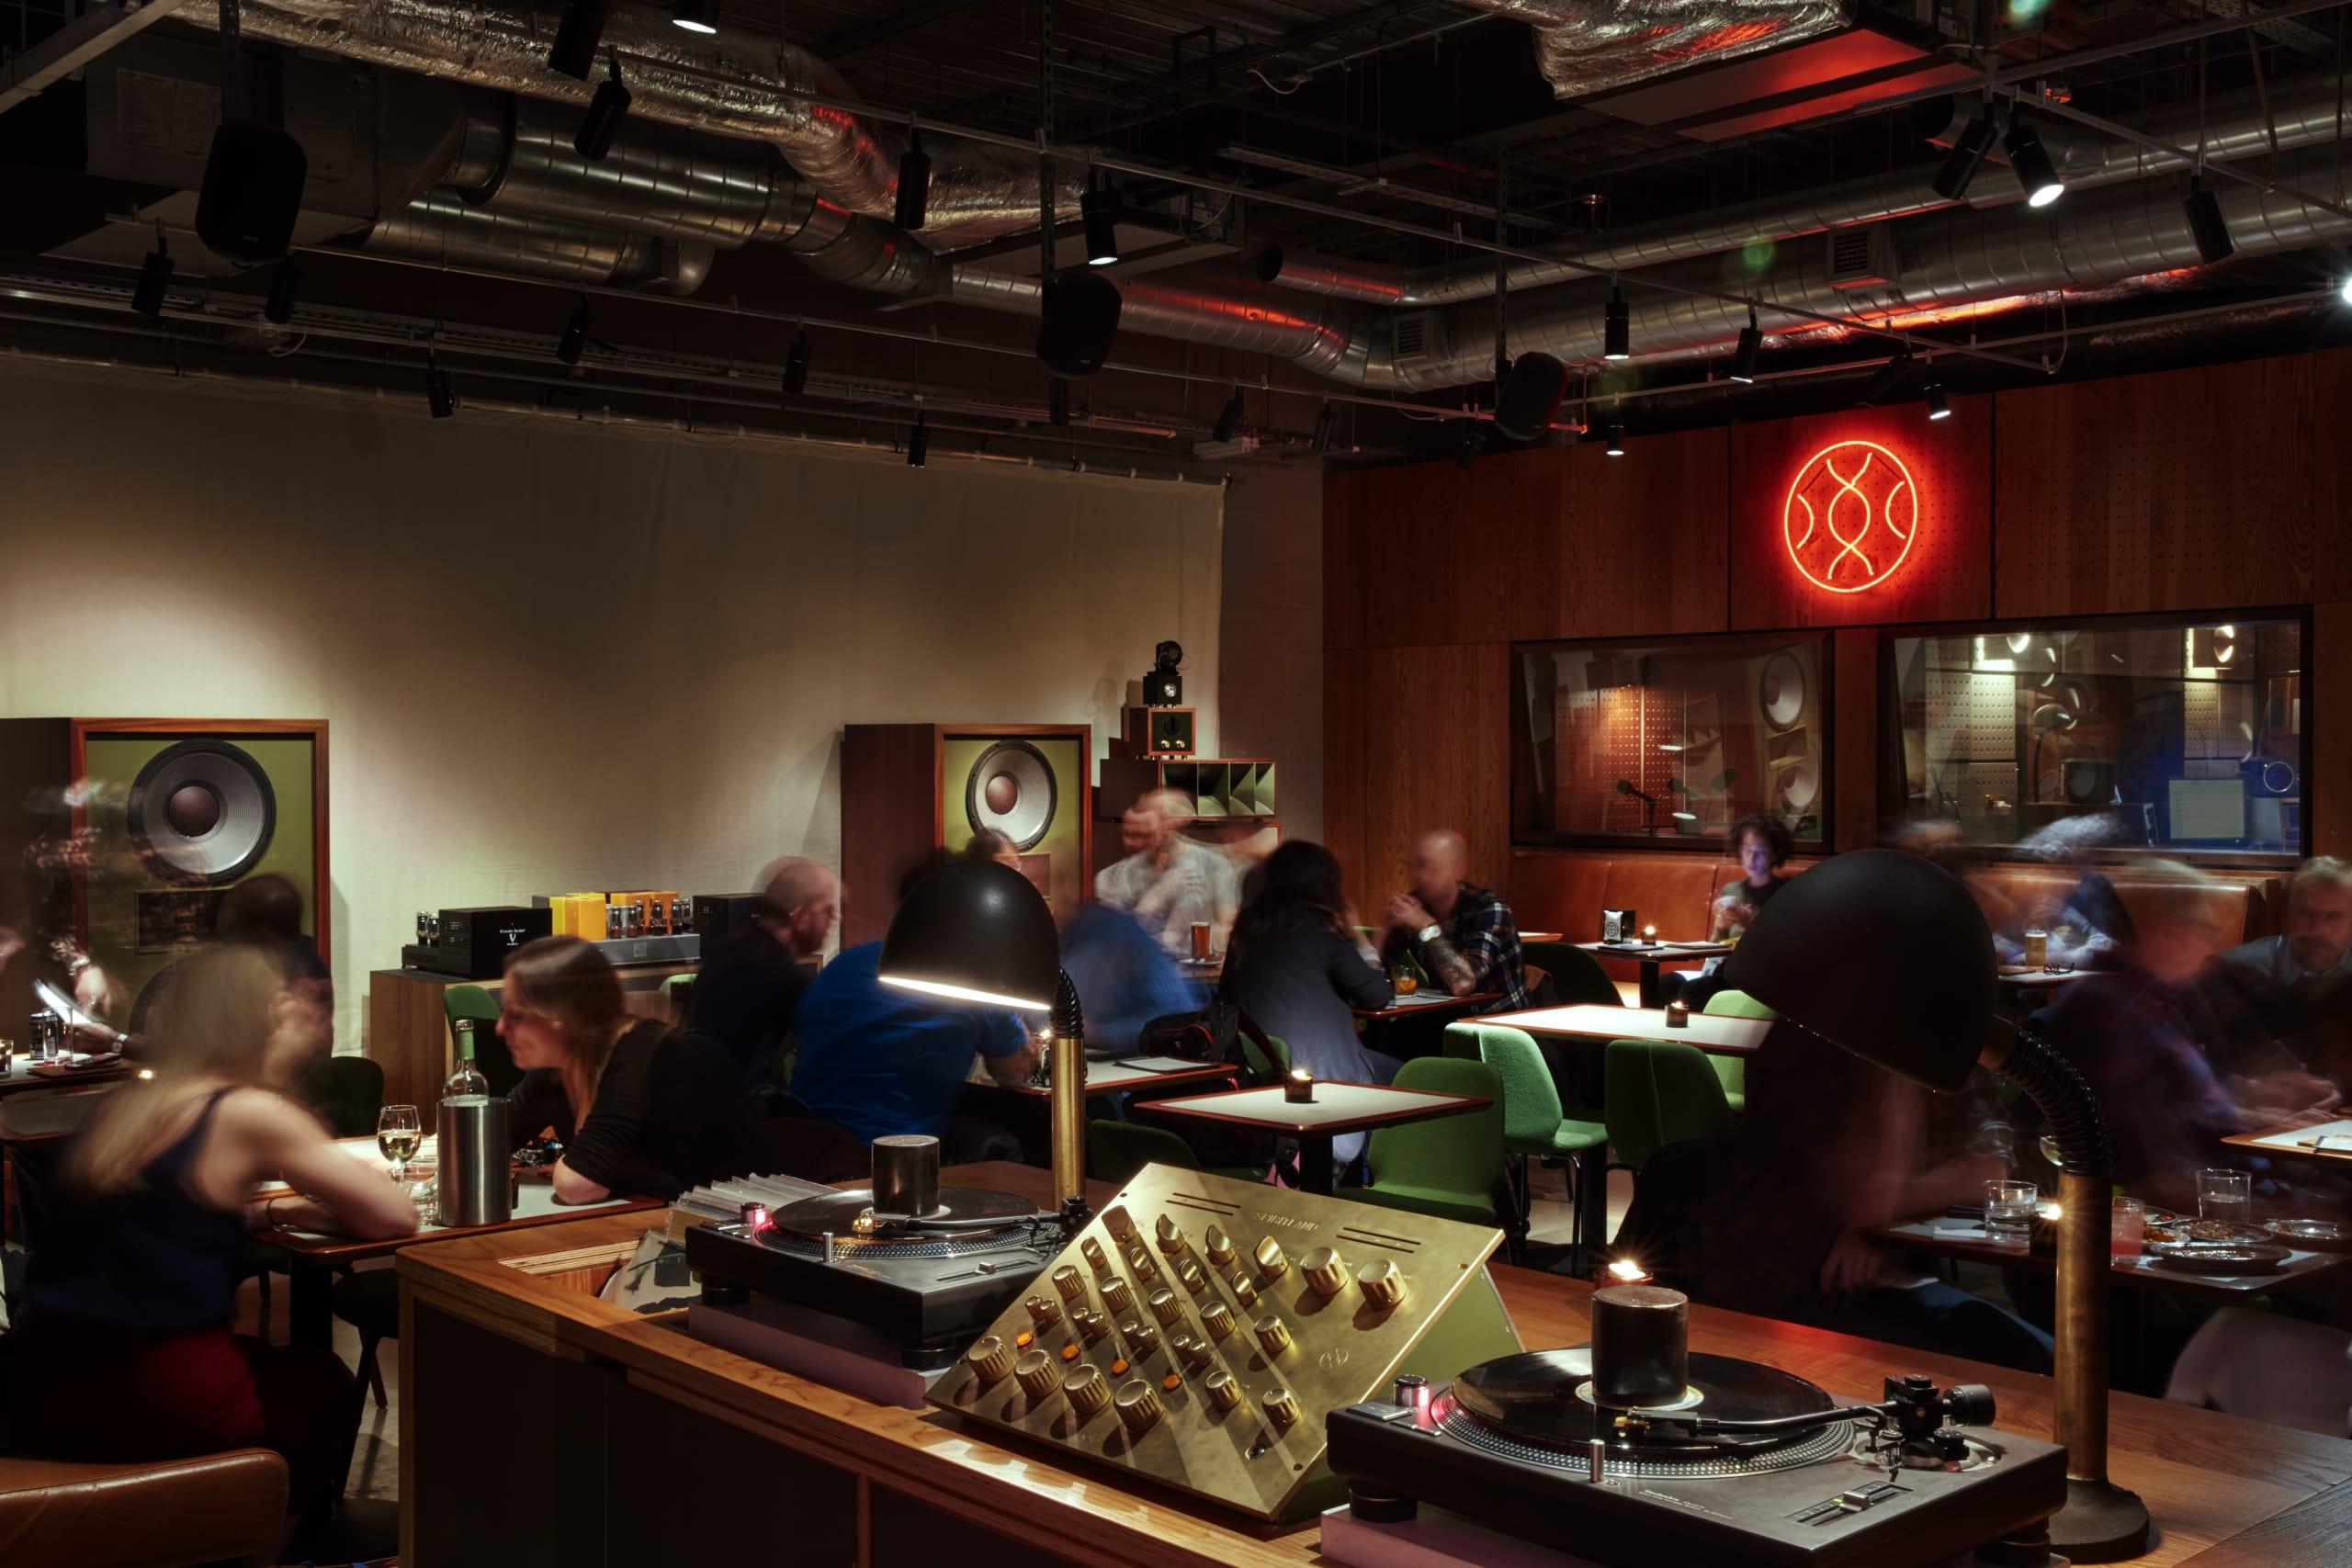 Spiritland(スピリットランド) -ロンドンのミュージックラバーズが集う場所